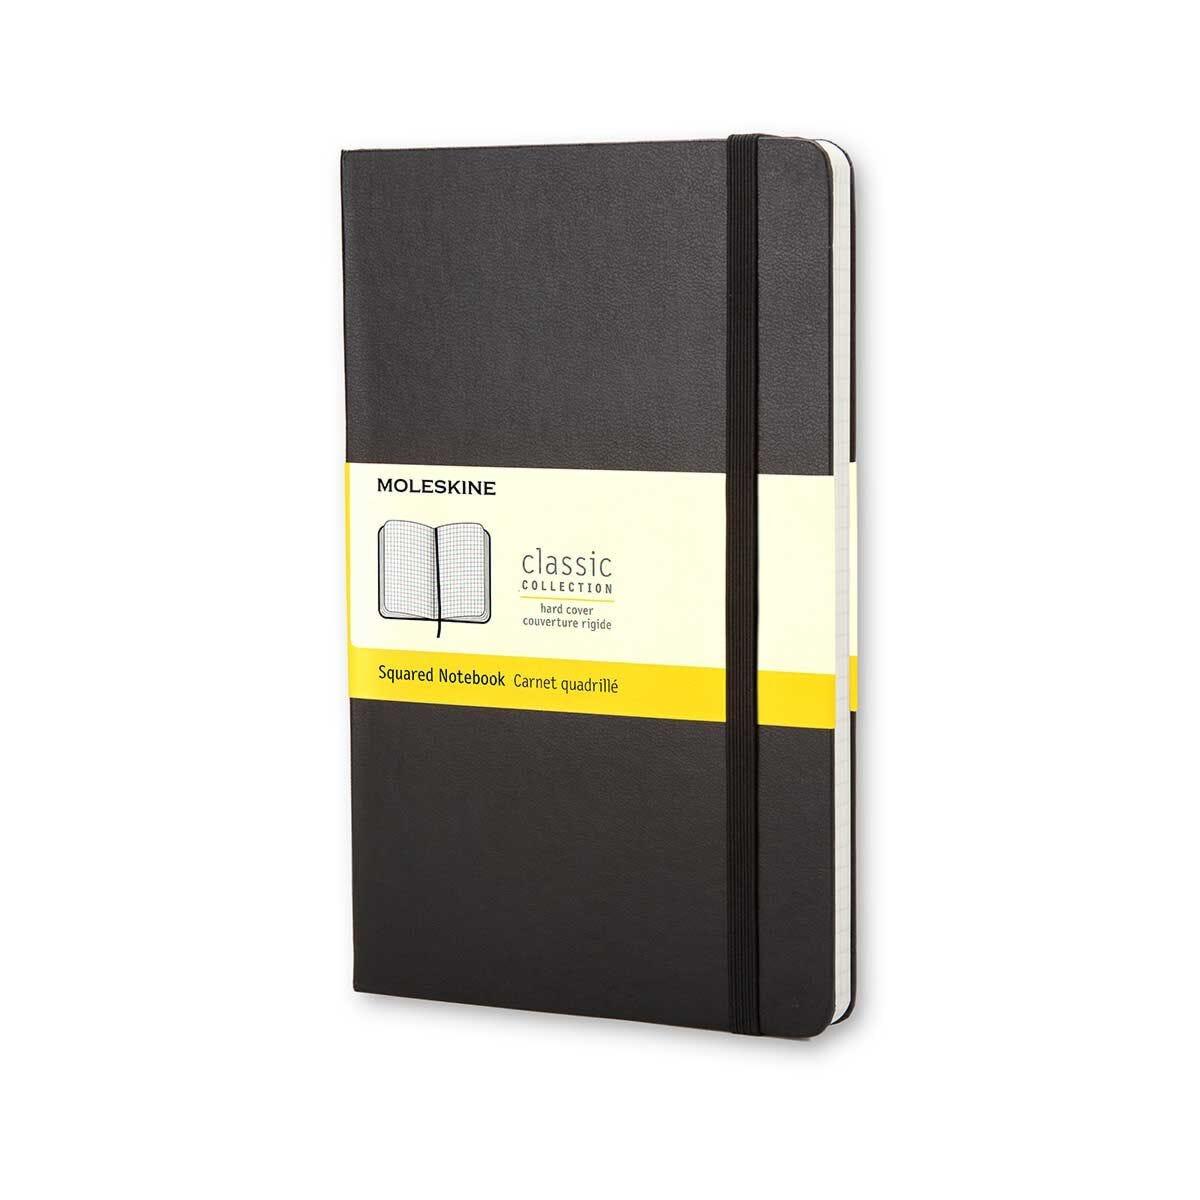 Moleskine Squared Pocket Notebook 192 Pages 96 Sheets